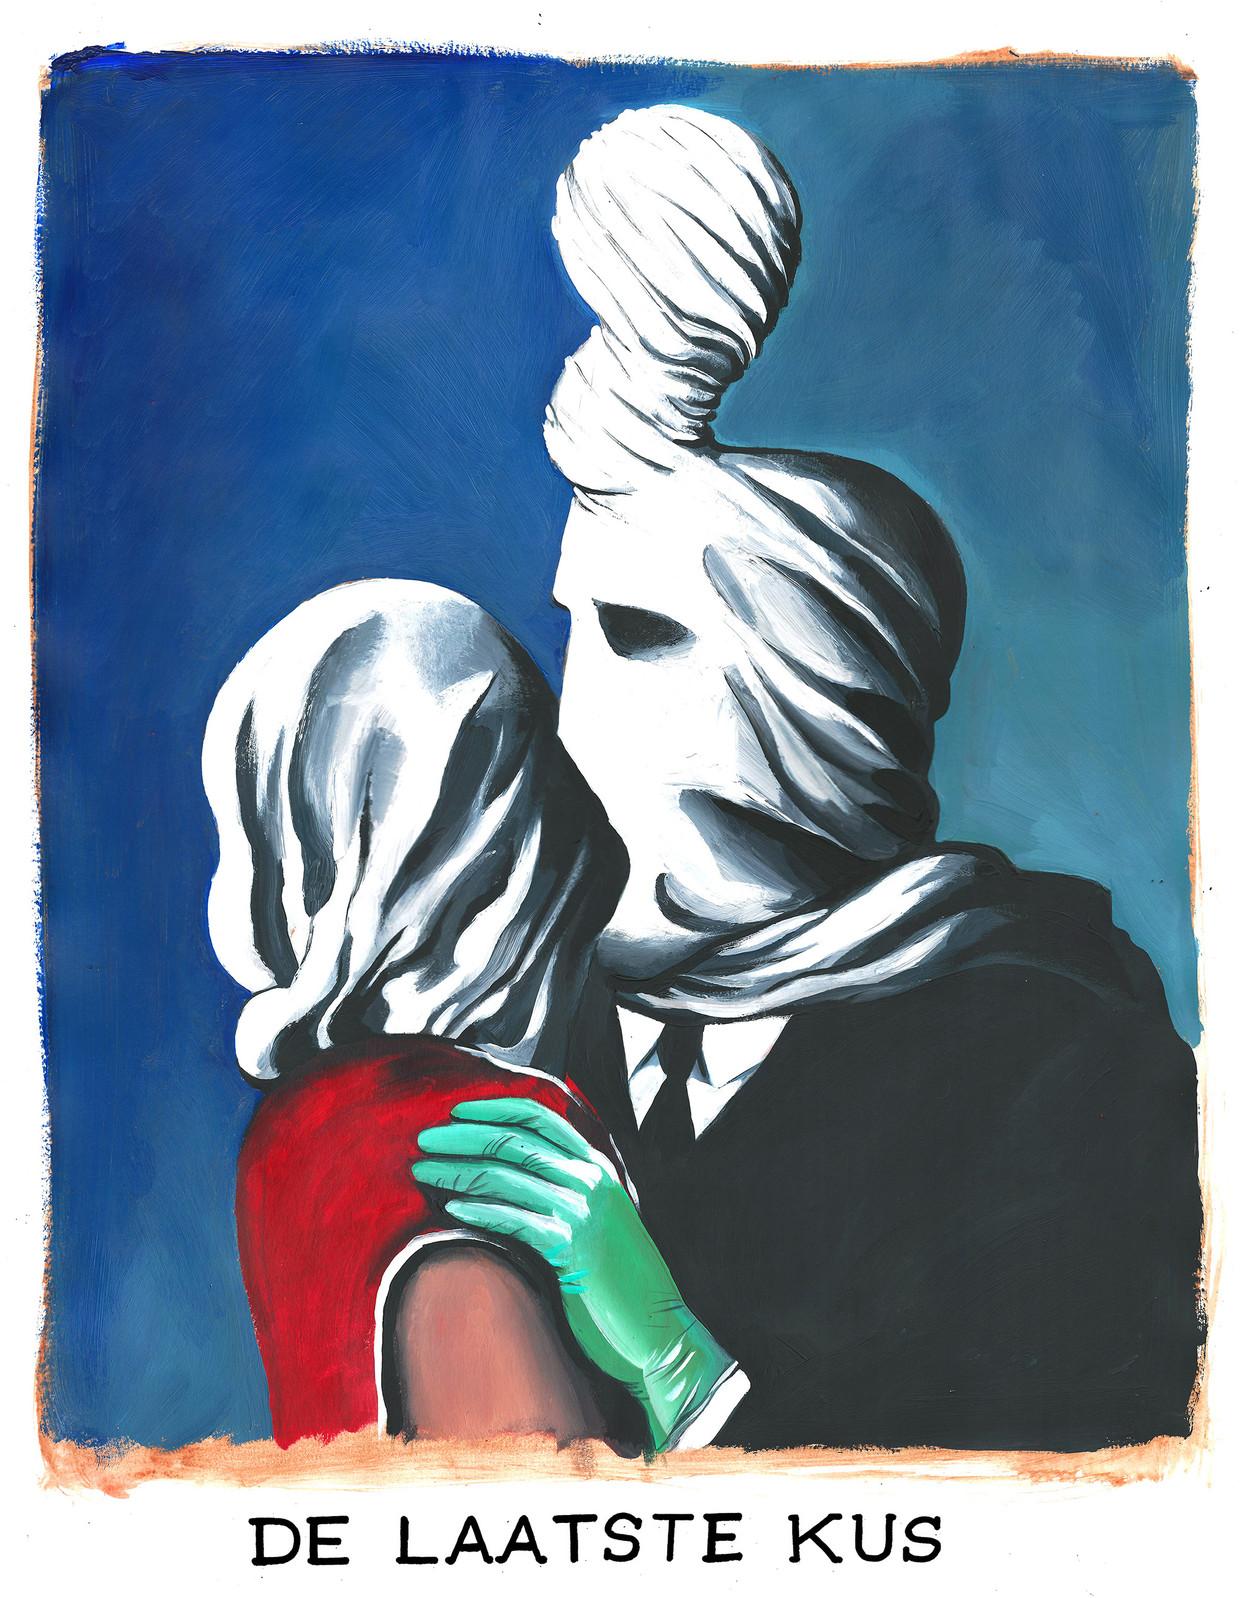 De laatste kus Beeld Kama & Seele